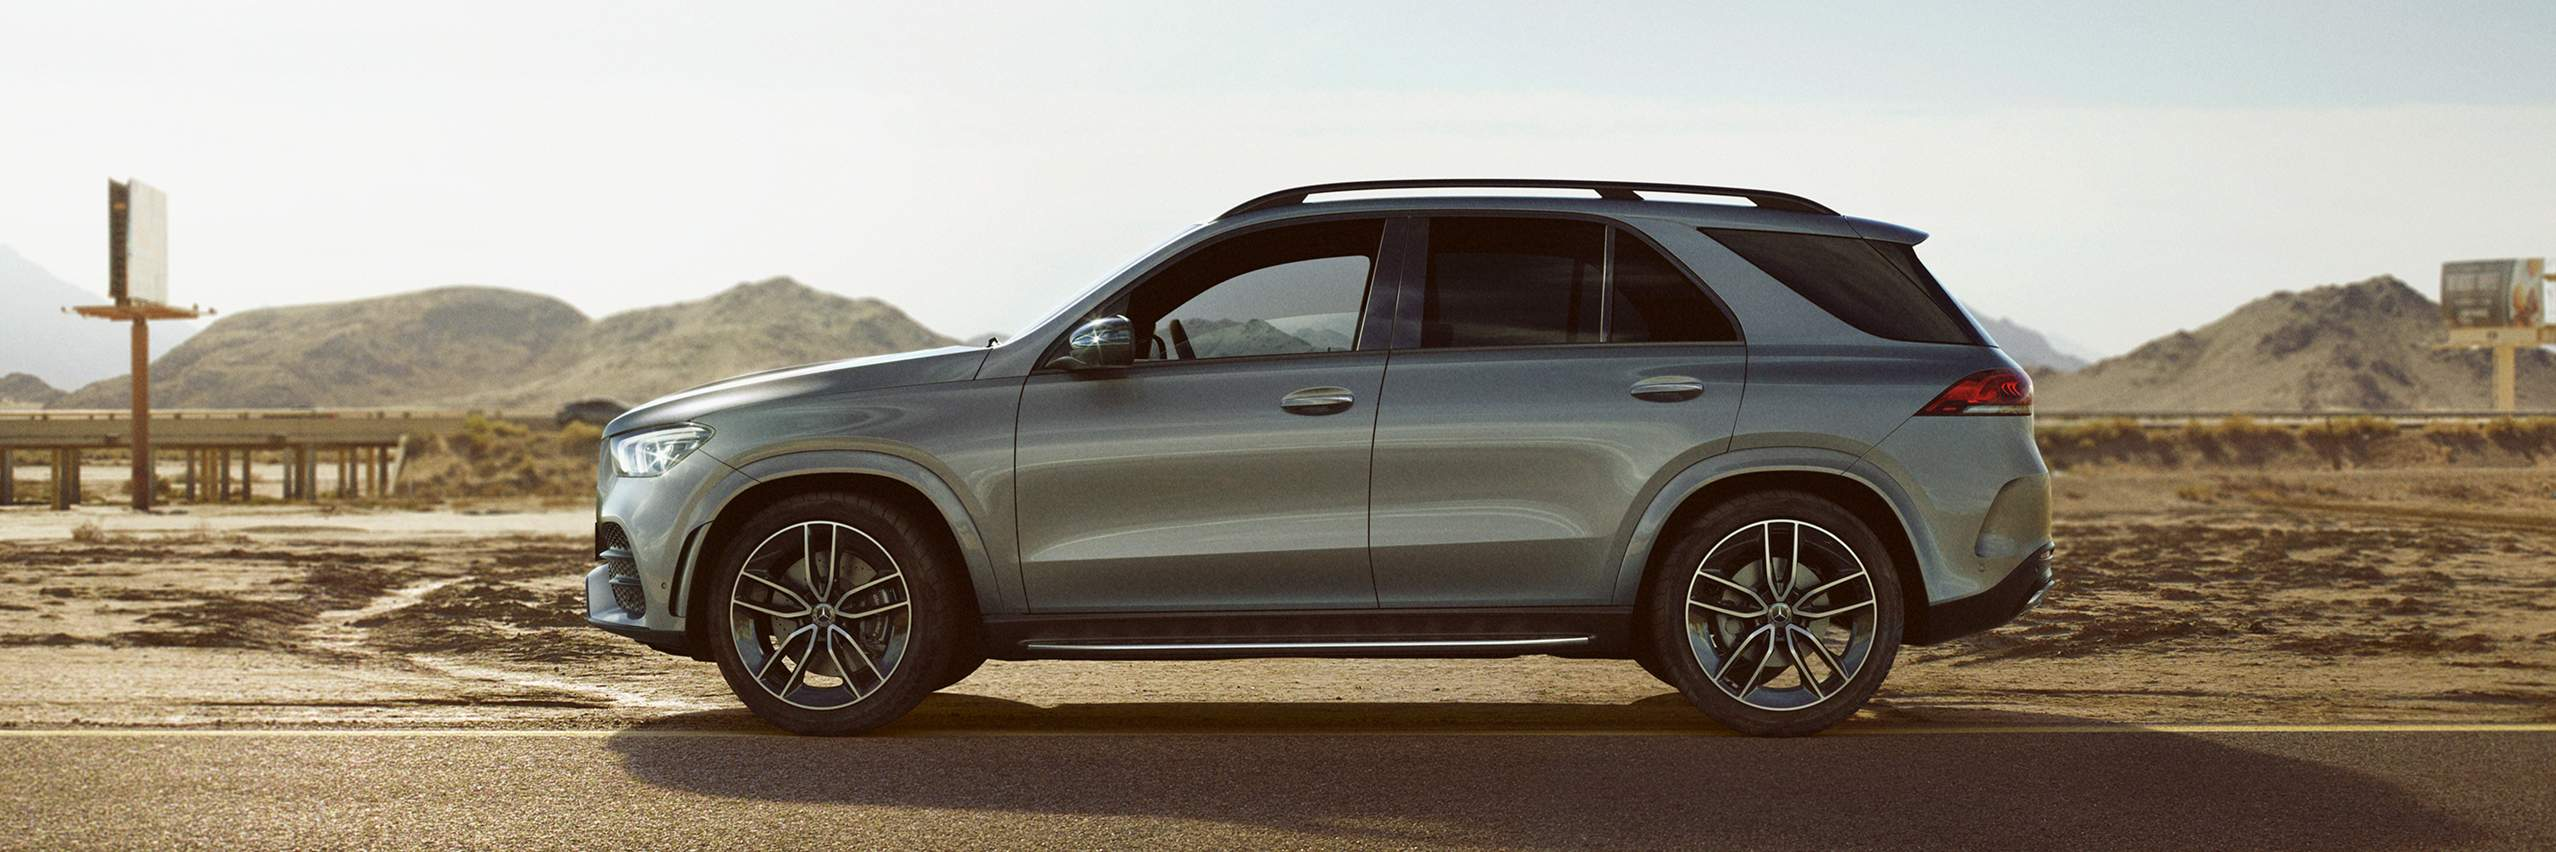 CAR-Avenue-Mercedes-Benz-GLE-SUV-06